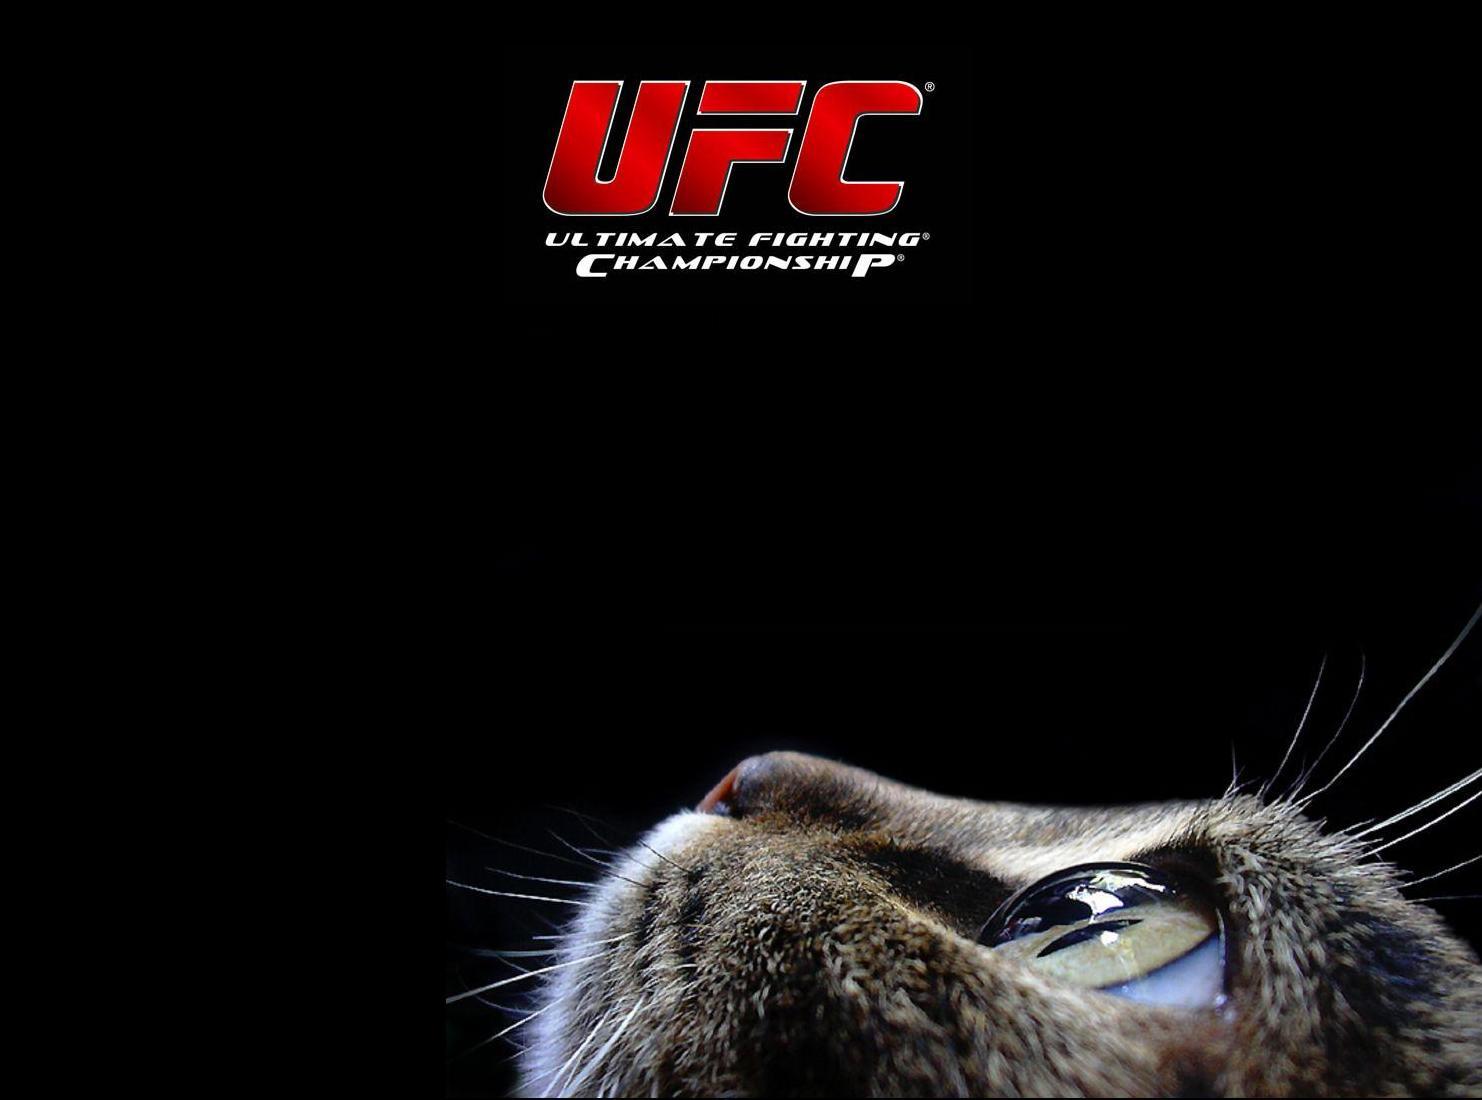 UFC Gallery UFC MMA Wallpaper Desktop Background Images 1482x1100